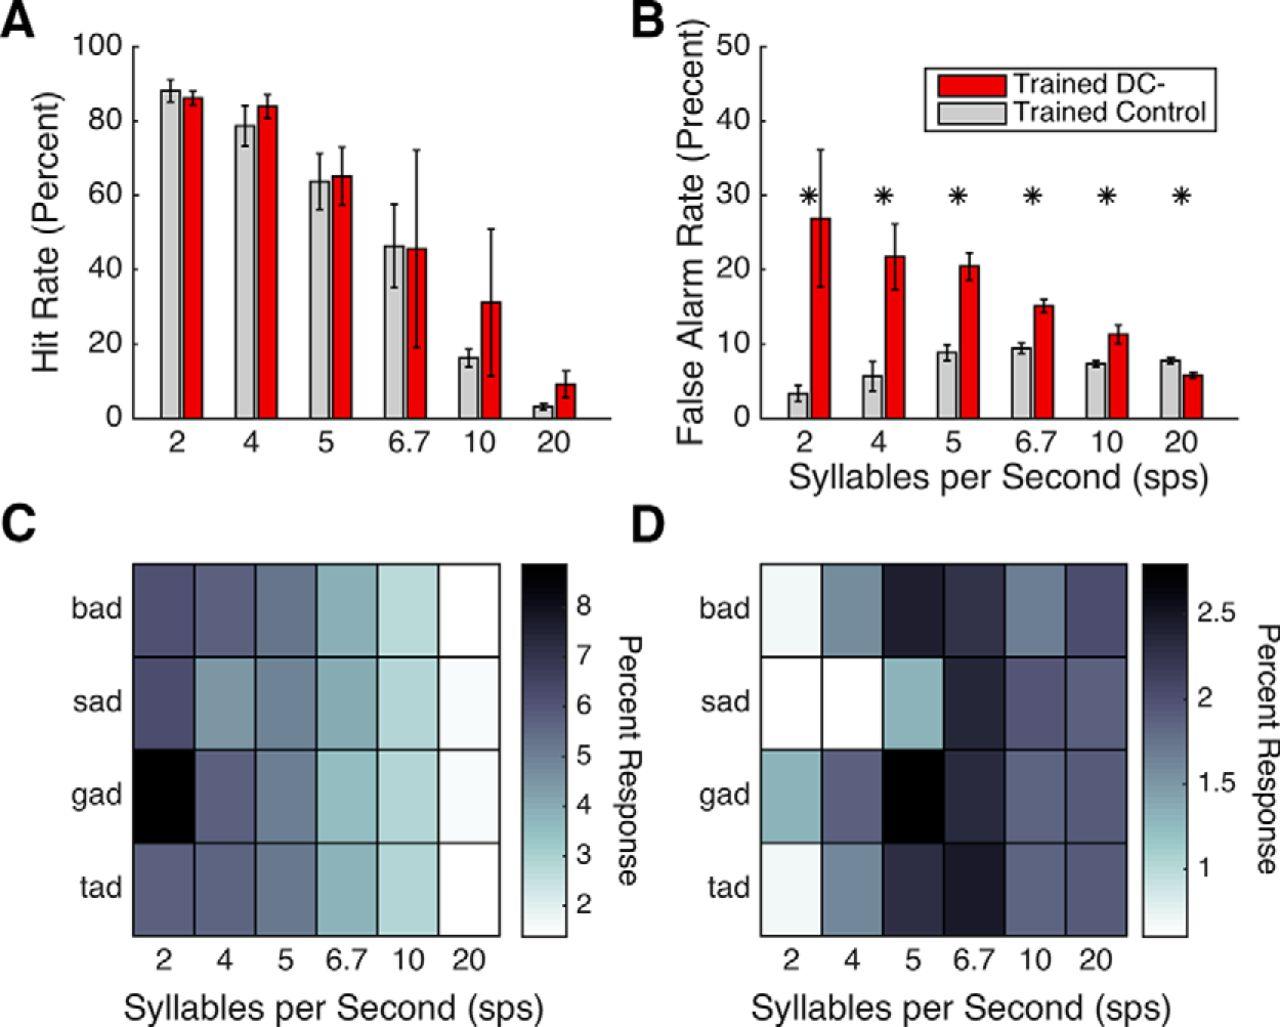 Knockdown of Dyslexia-Gene Dcdc2 Interferes with Speech Sound